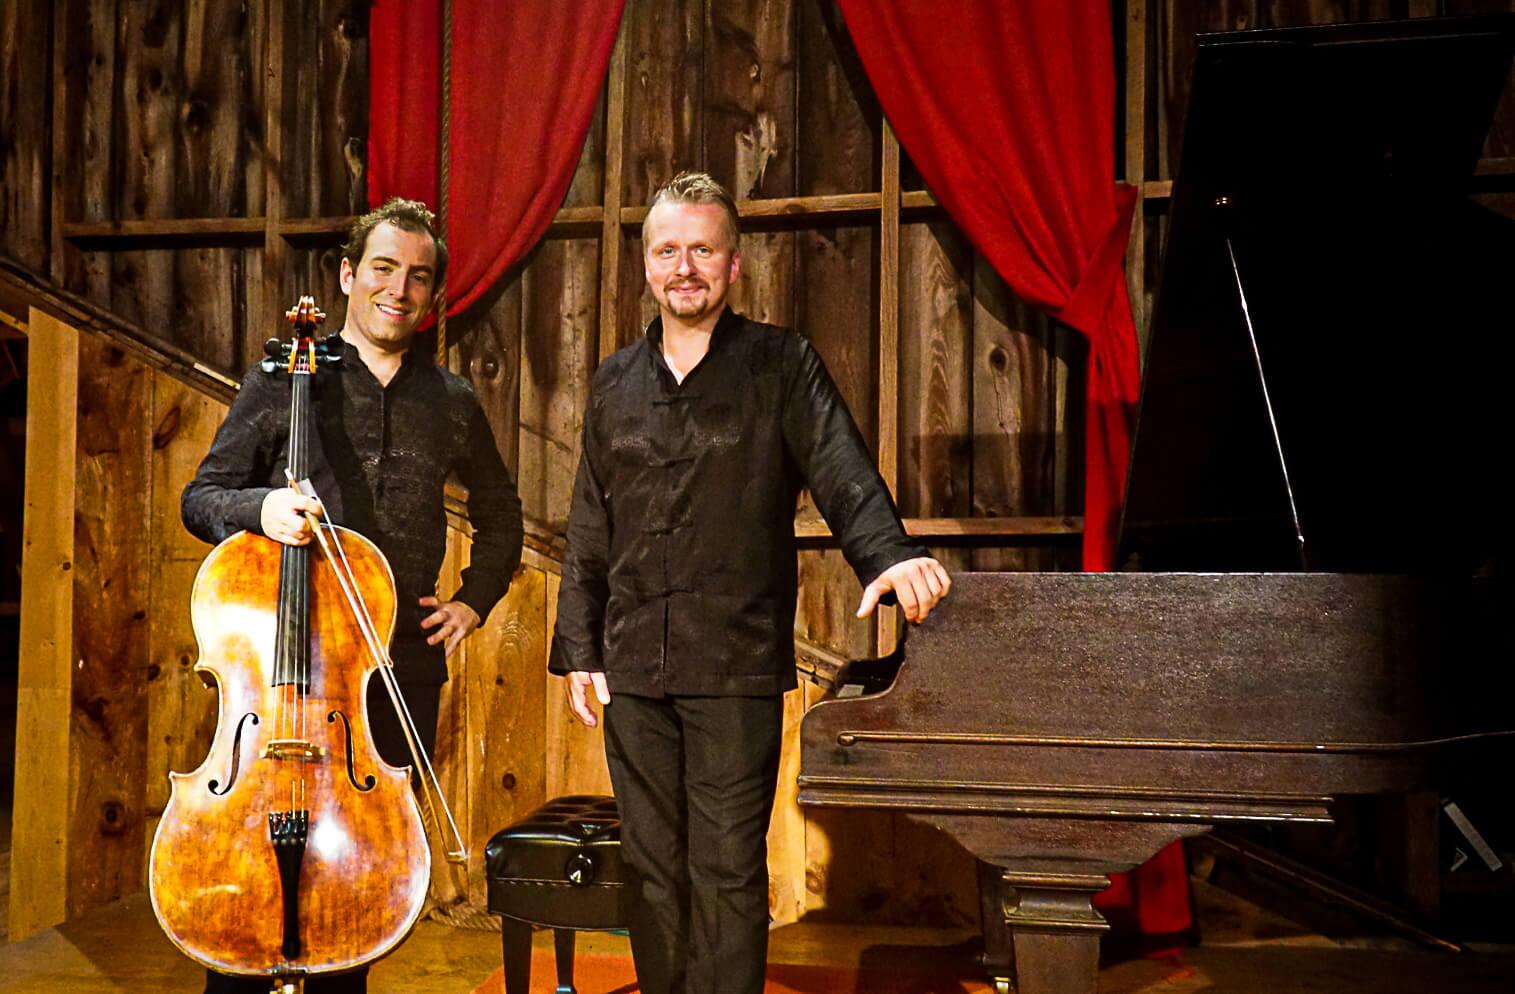 cellist Thomas Mesa and pianist Ilya Yakushev